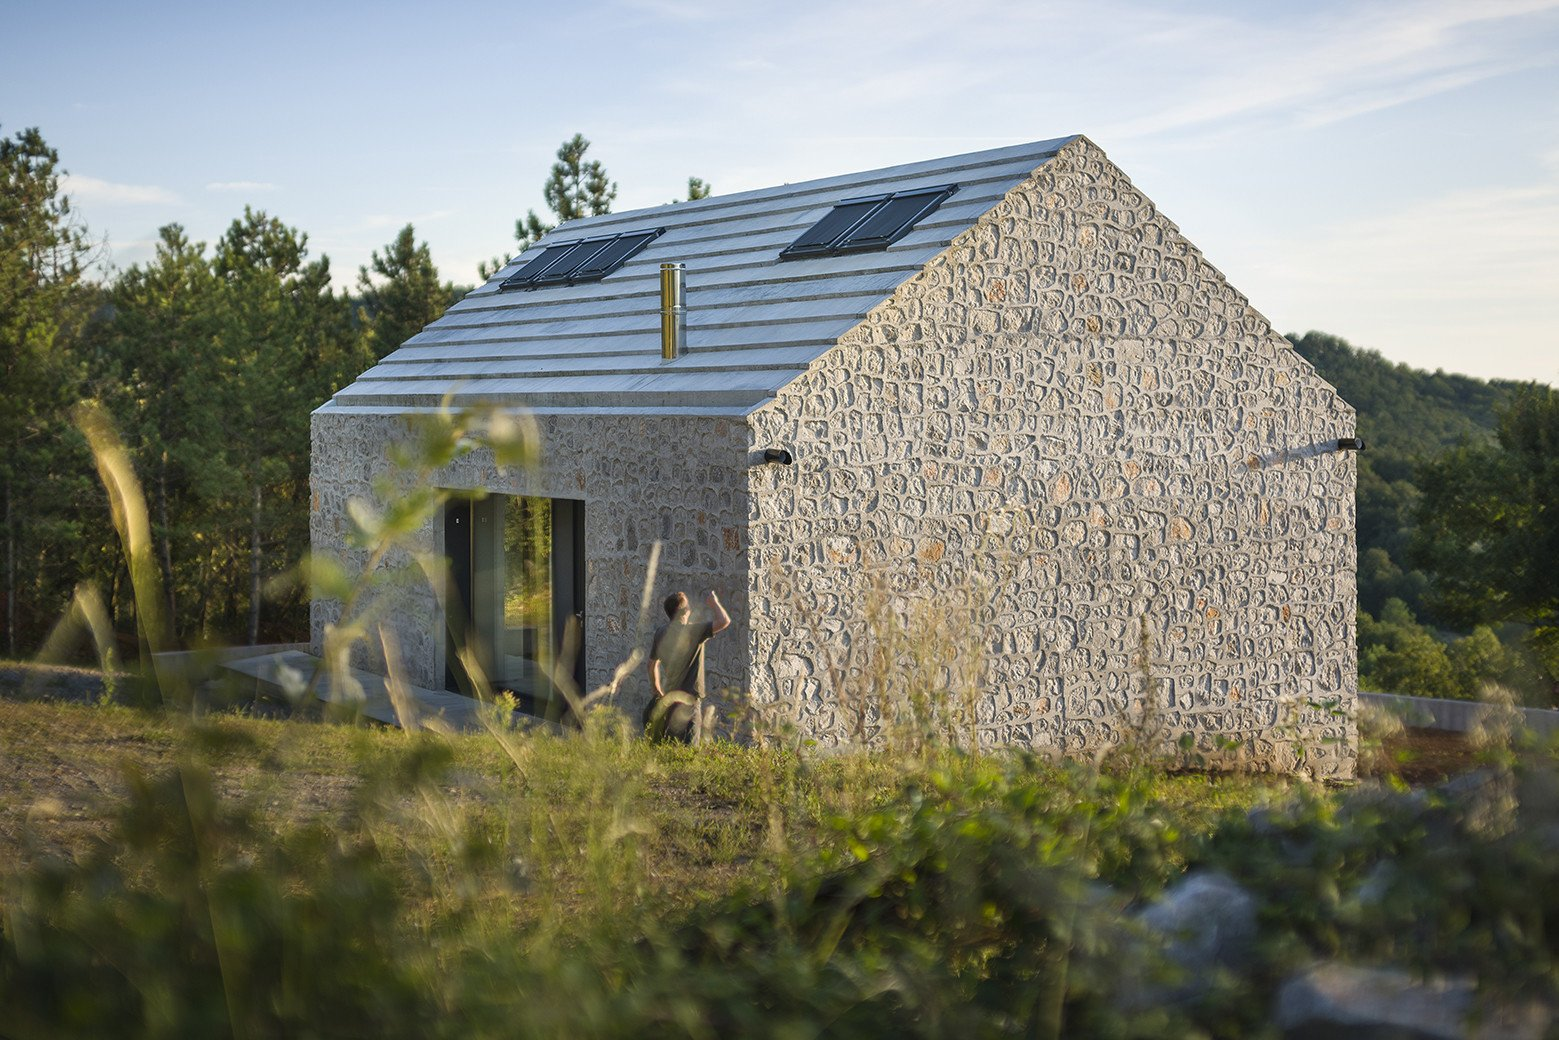 Compact Karst House by dekleva gregorič arhitekti  Photo 5 of 16 in These 4 Modern Homes Around the World Take Advantage of Local Stone